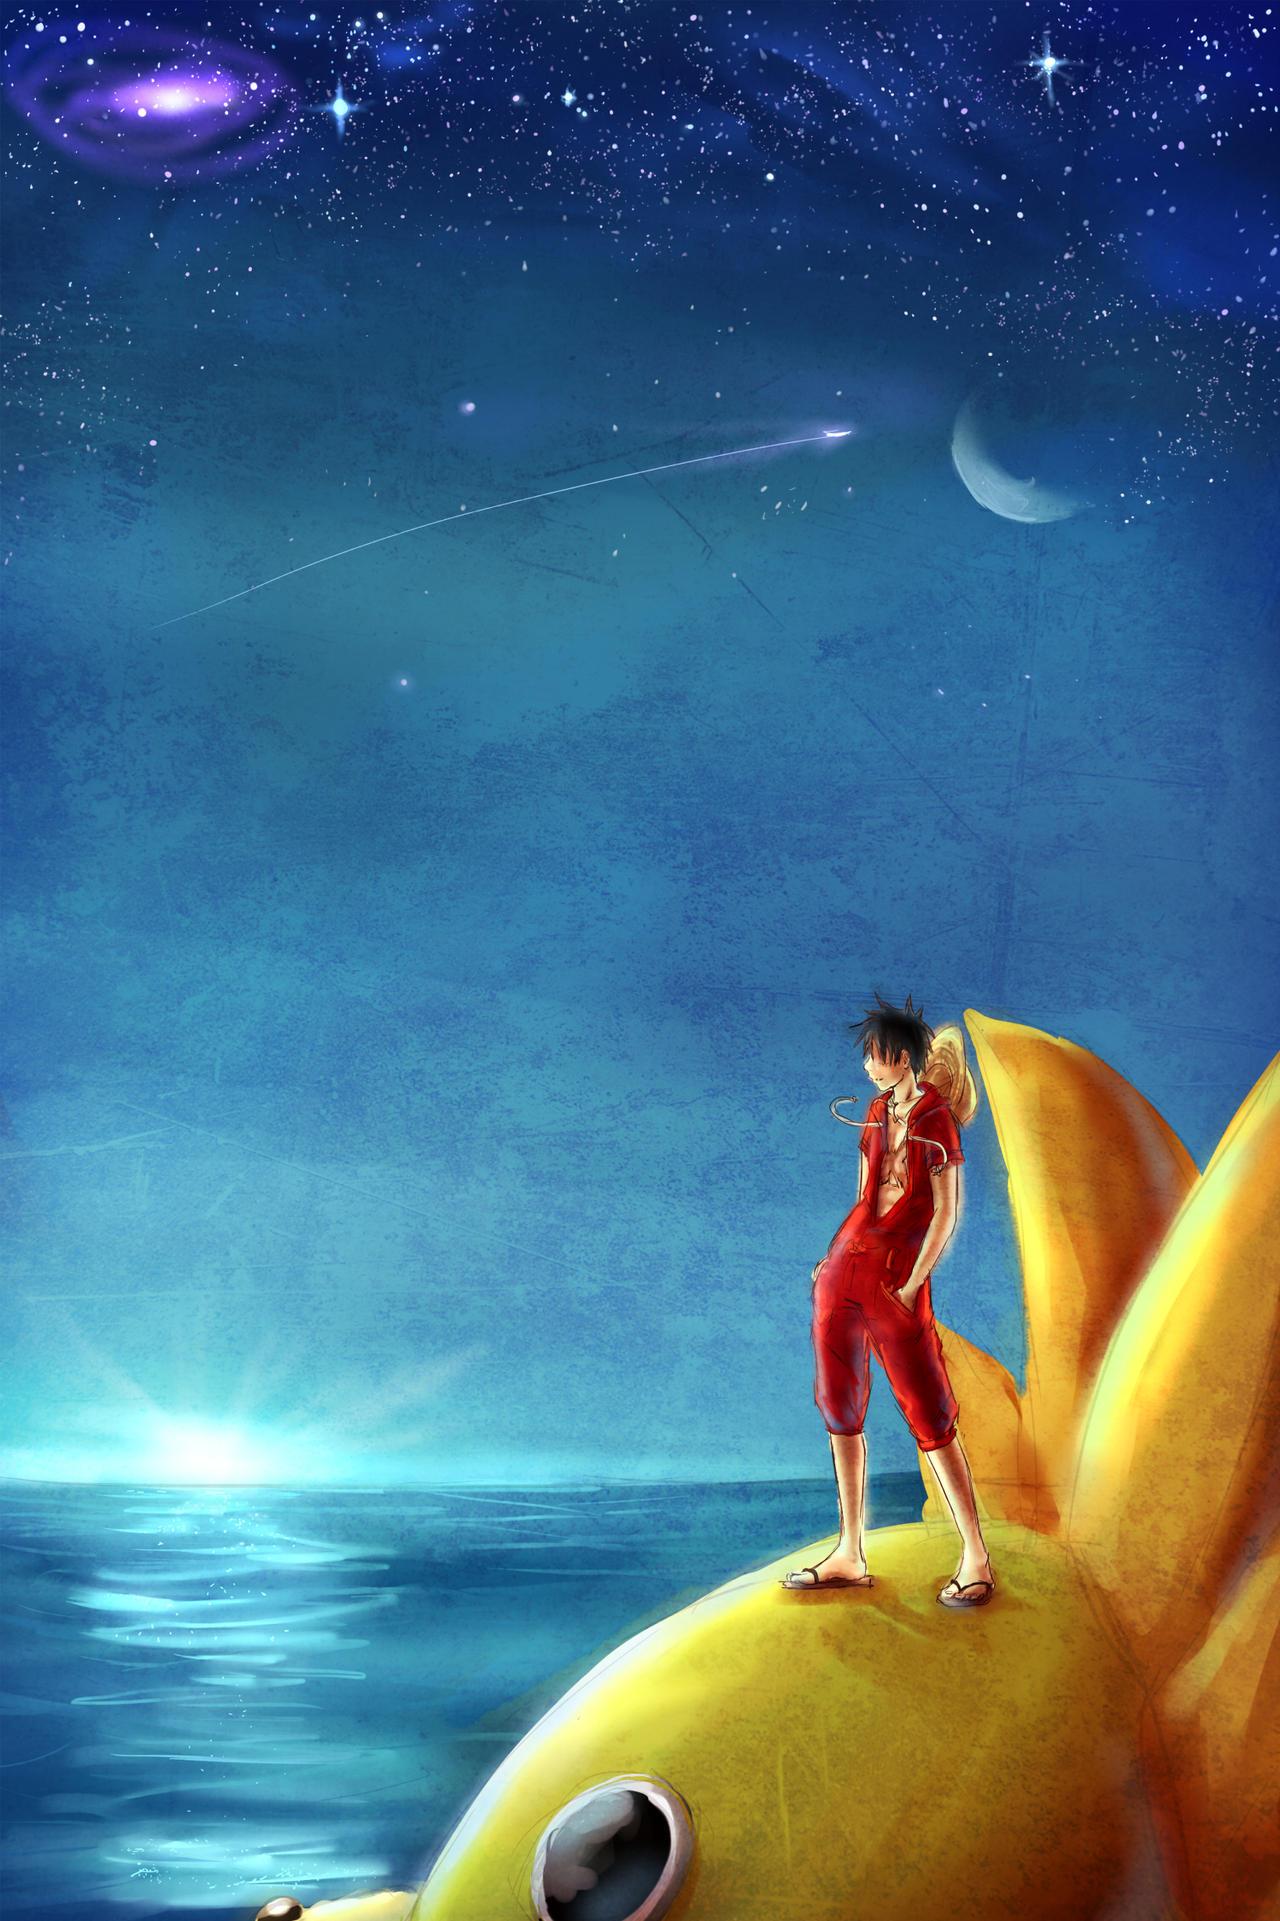 Dream On by Fran-Scythe